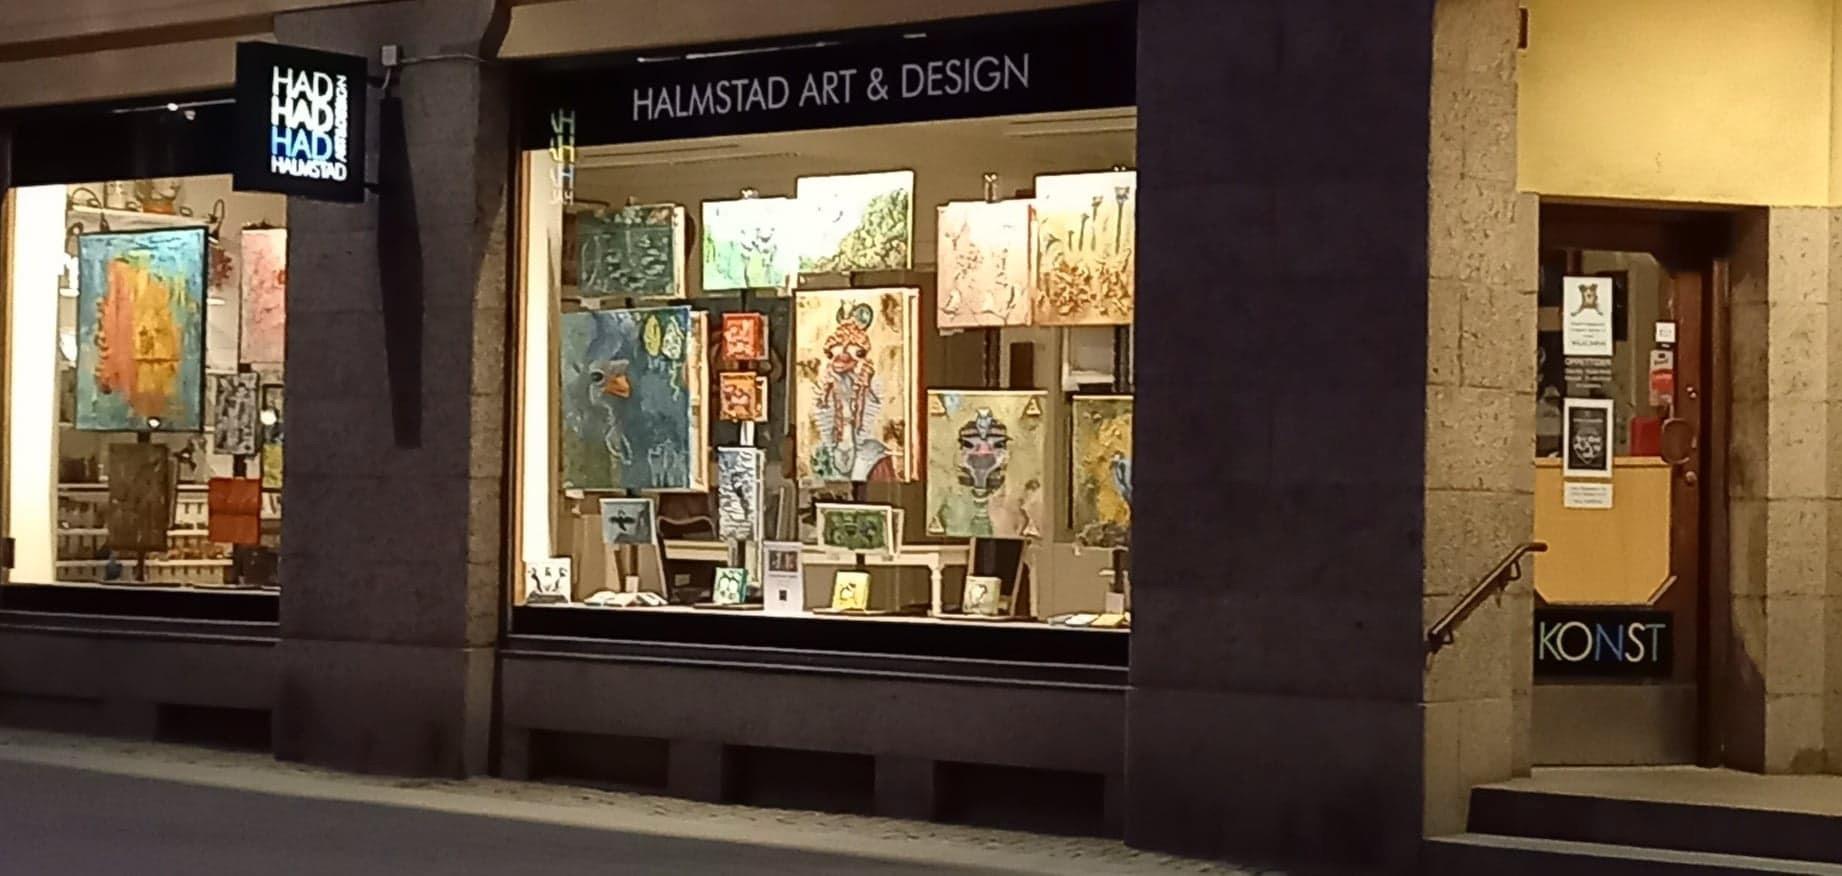 Halmstad Art & Design